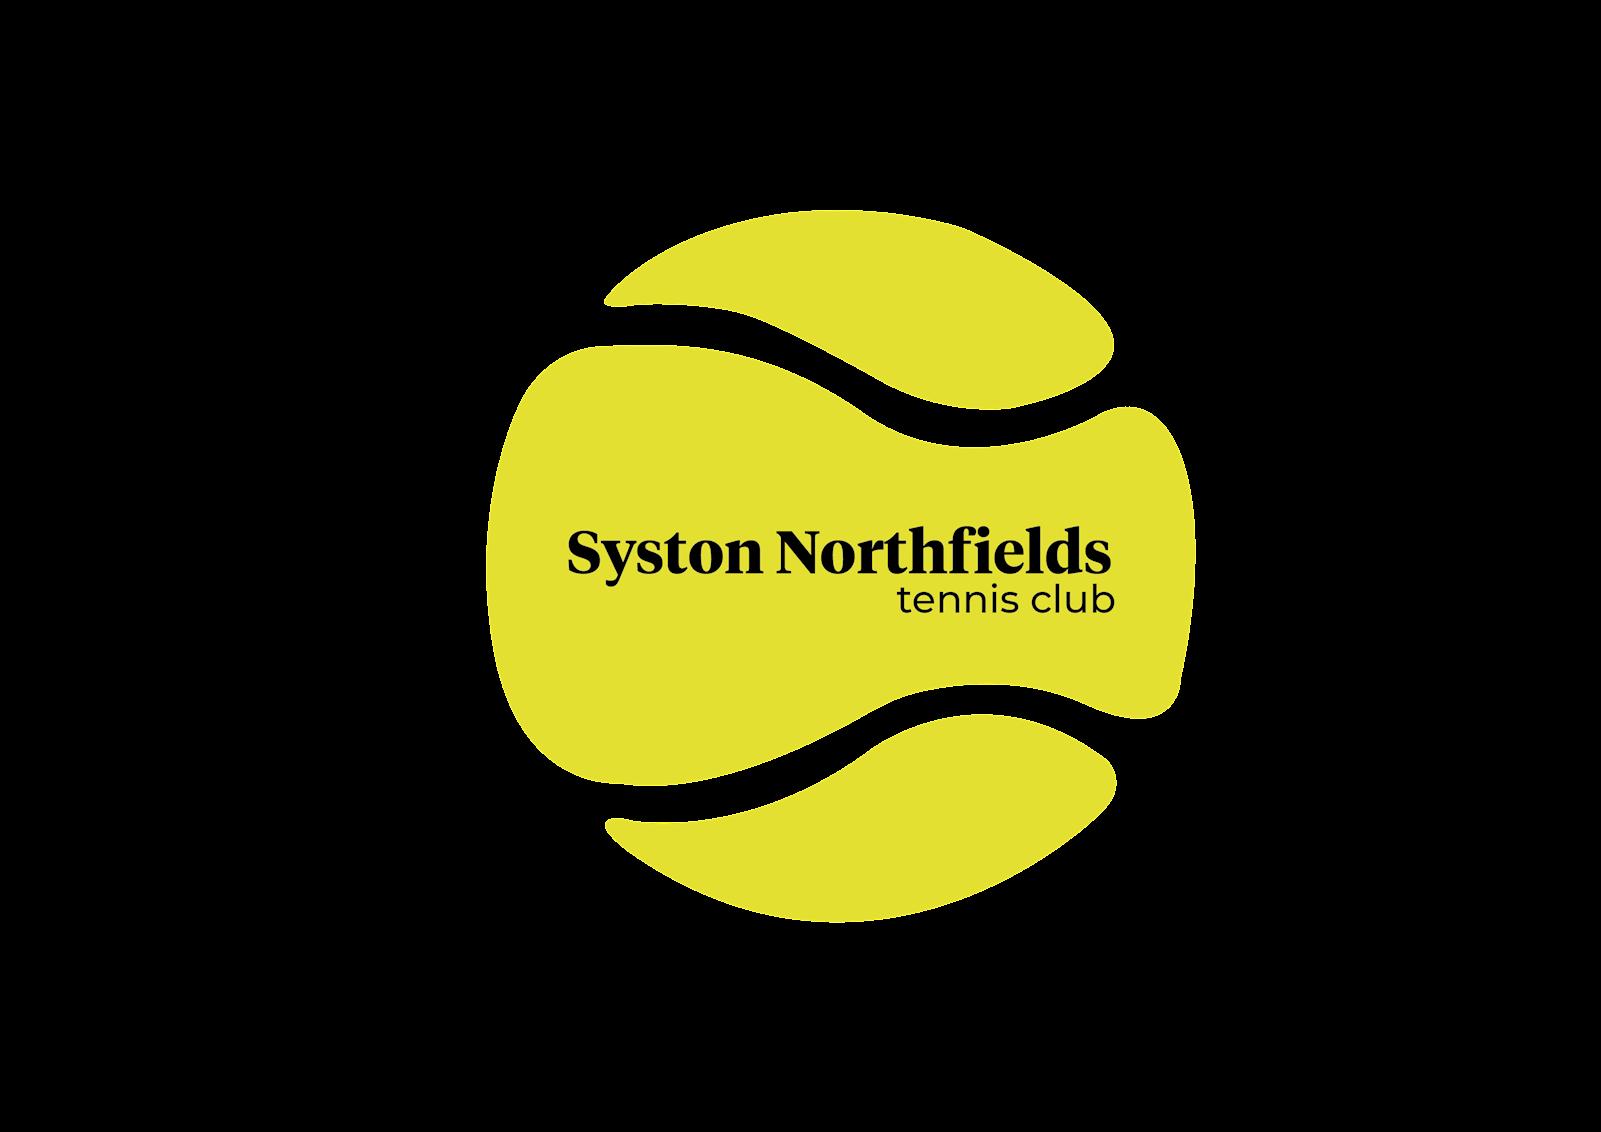 Syston Northfields Tennis Club